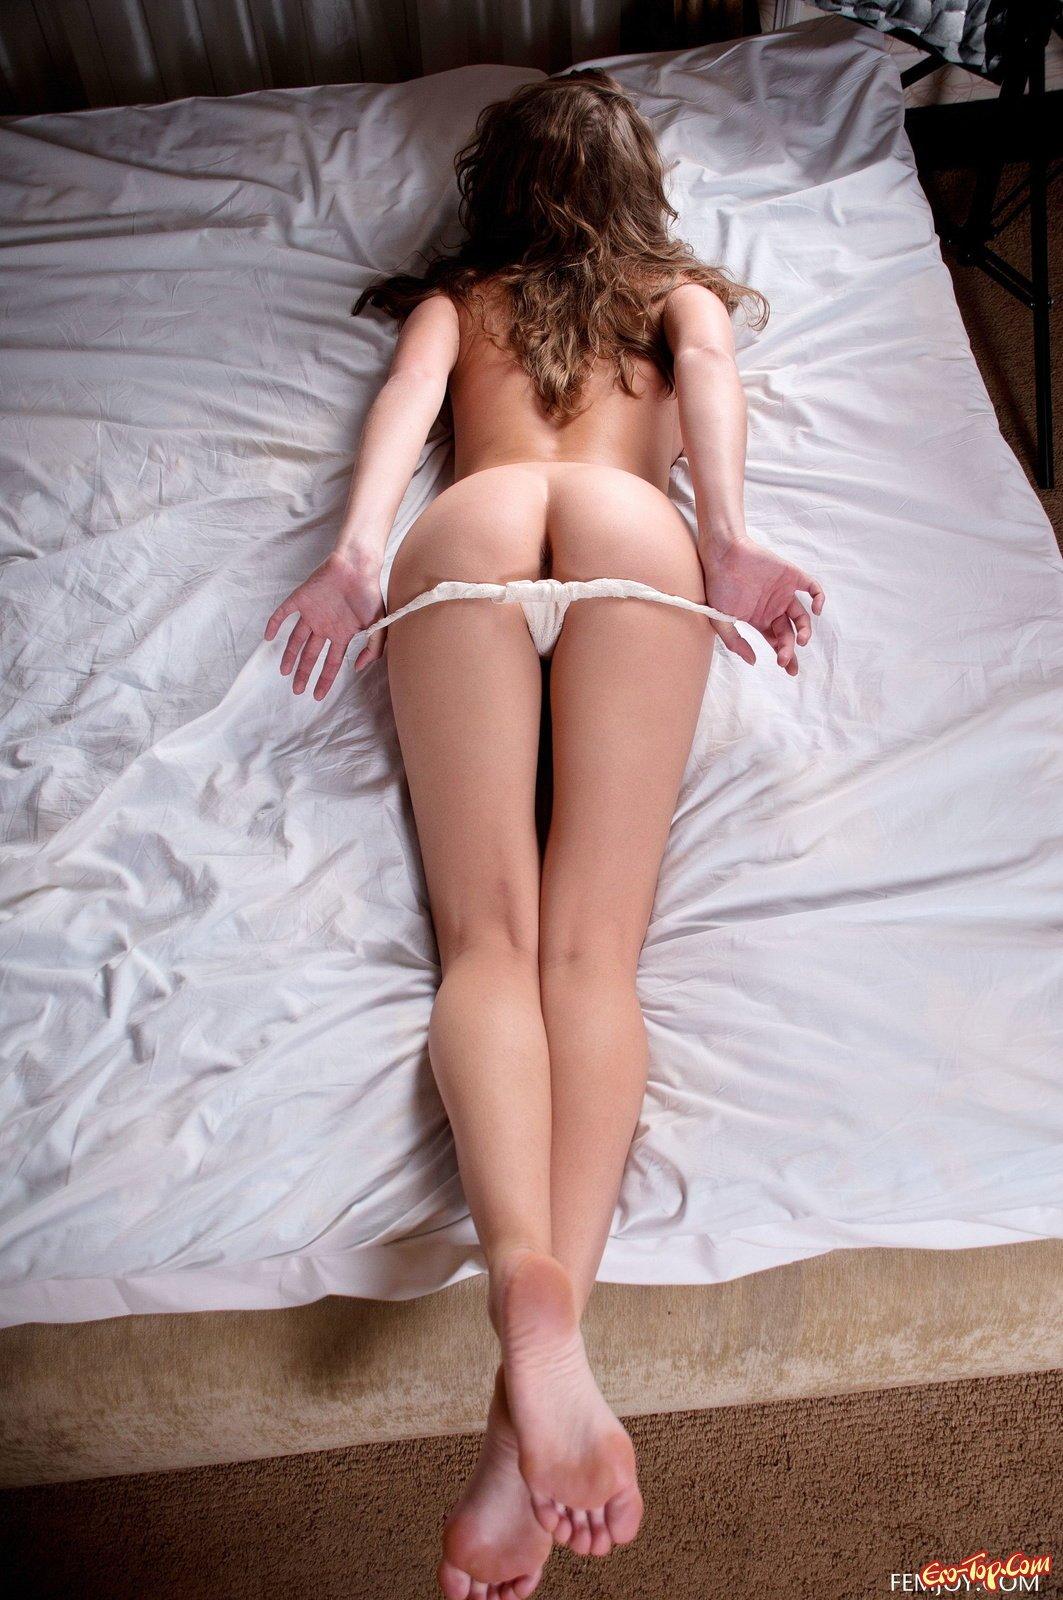 Красотка снимает трусики лежа на простыне